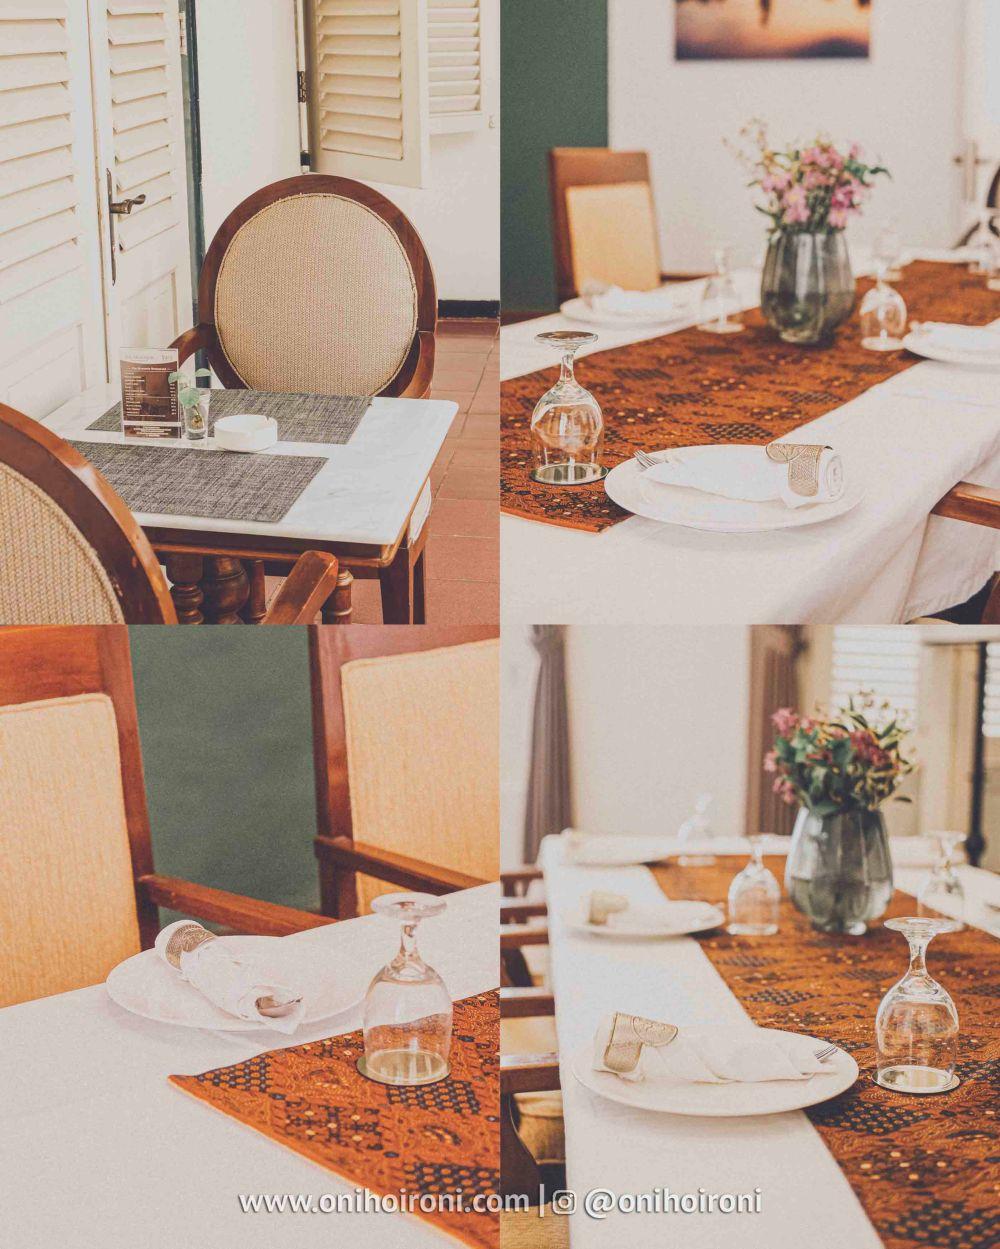 11 Review Restoran The Melchior Bogor by Baio oni hoironi